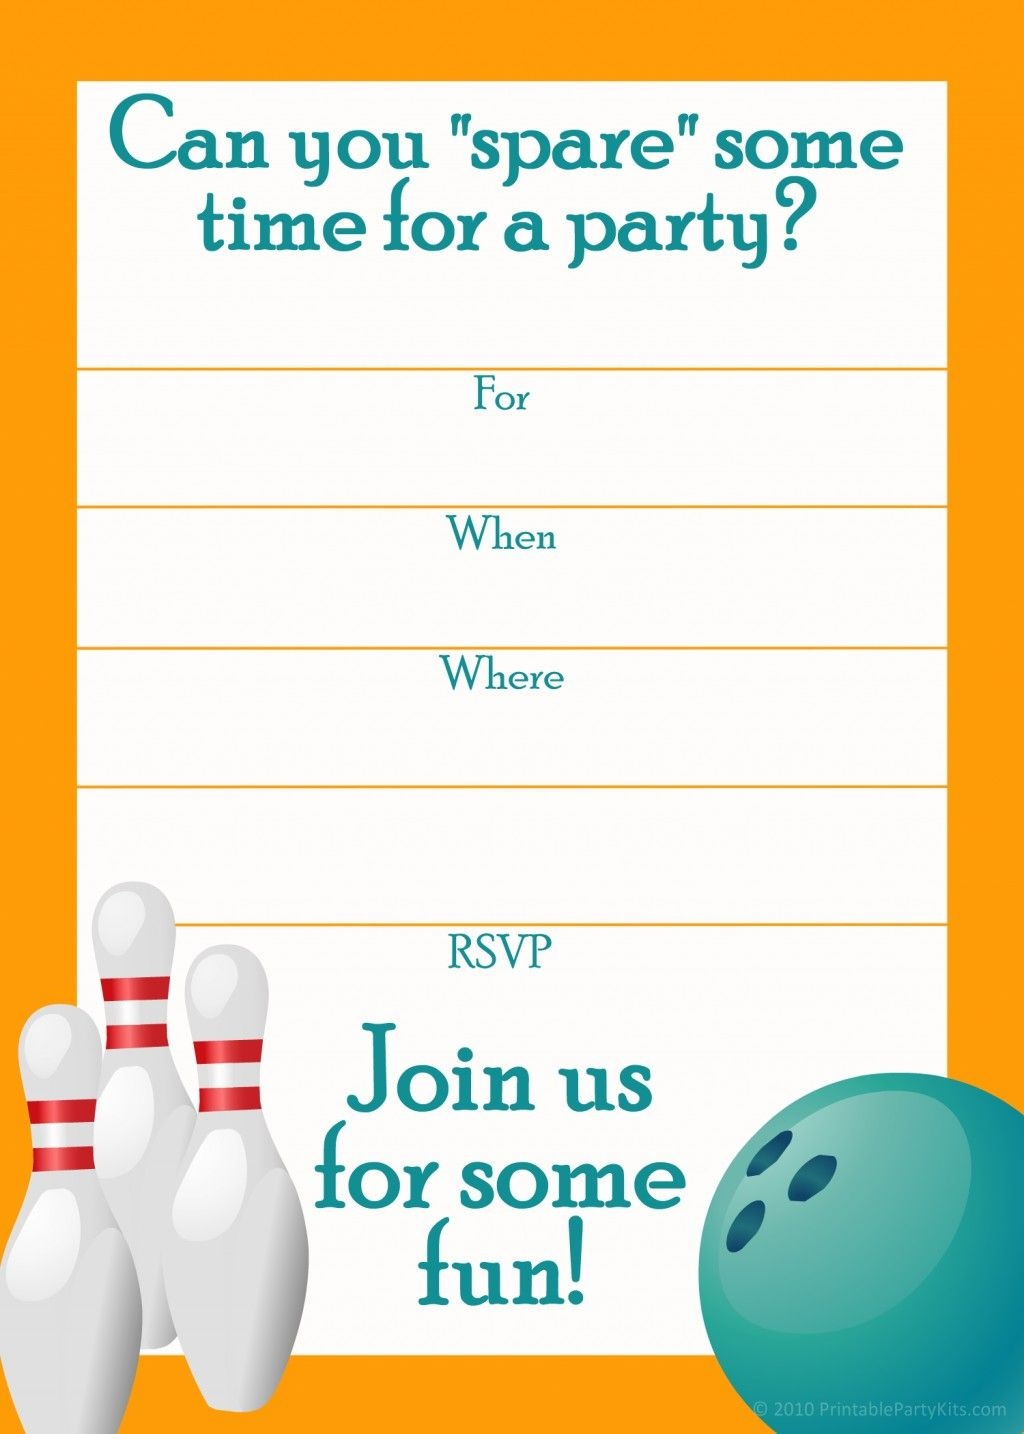 Free Printable Sports Birthday Party Invitations Templates   Dakota - Free Printable Bowling Birthday Party Invitations